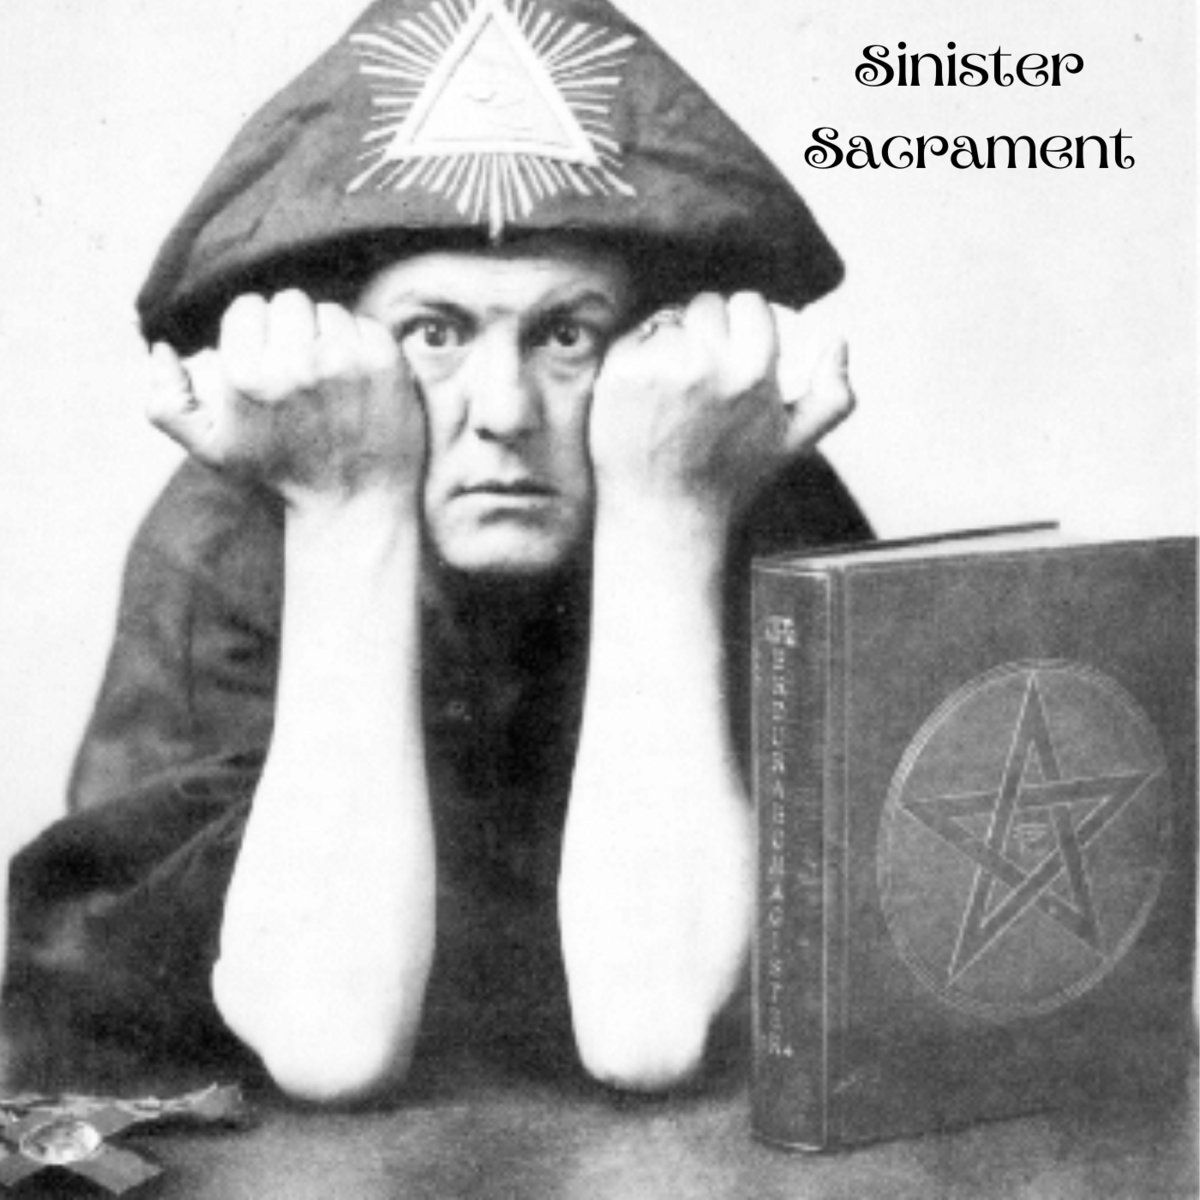 Sinister Sacrament - Sinister Sacrament